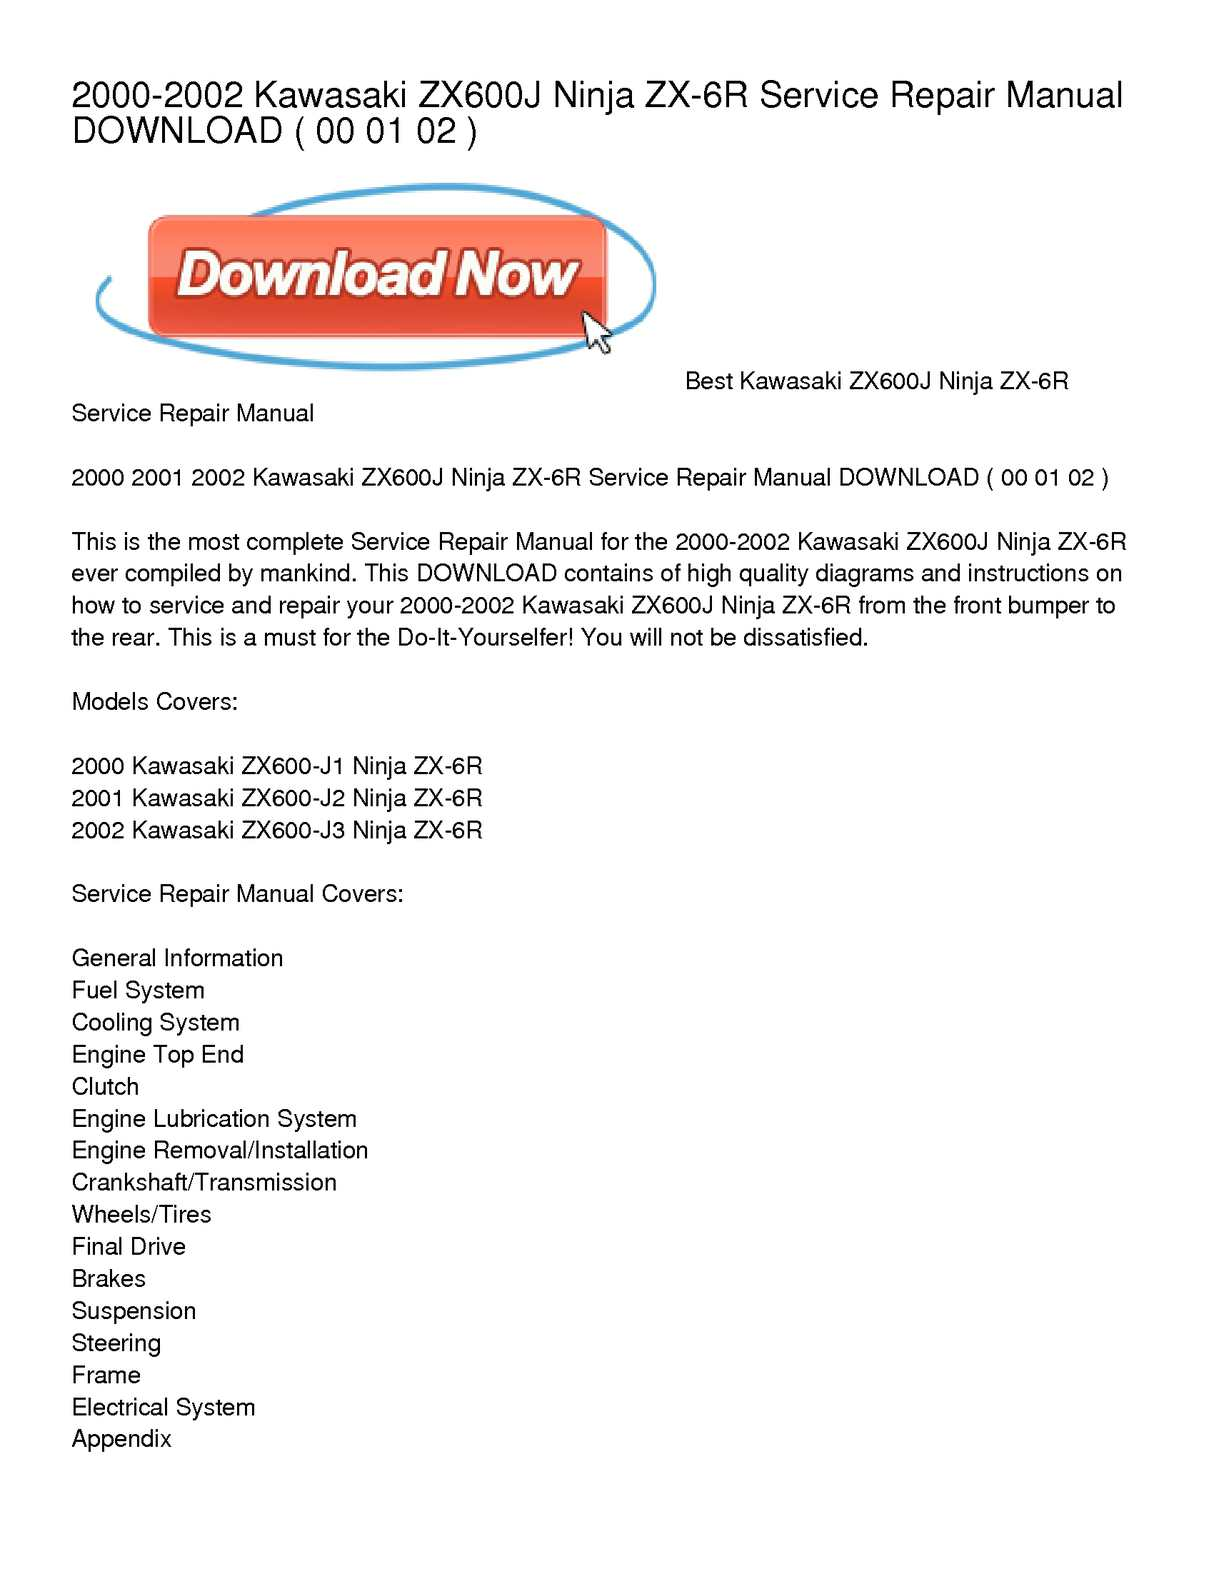 Calamo 2000 2002 Kawasaki Zx600j Ninja Zx 6r Service Repair 2001 Bobcat Wiring Diagram Manual Download